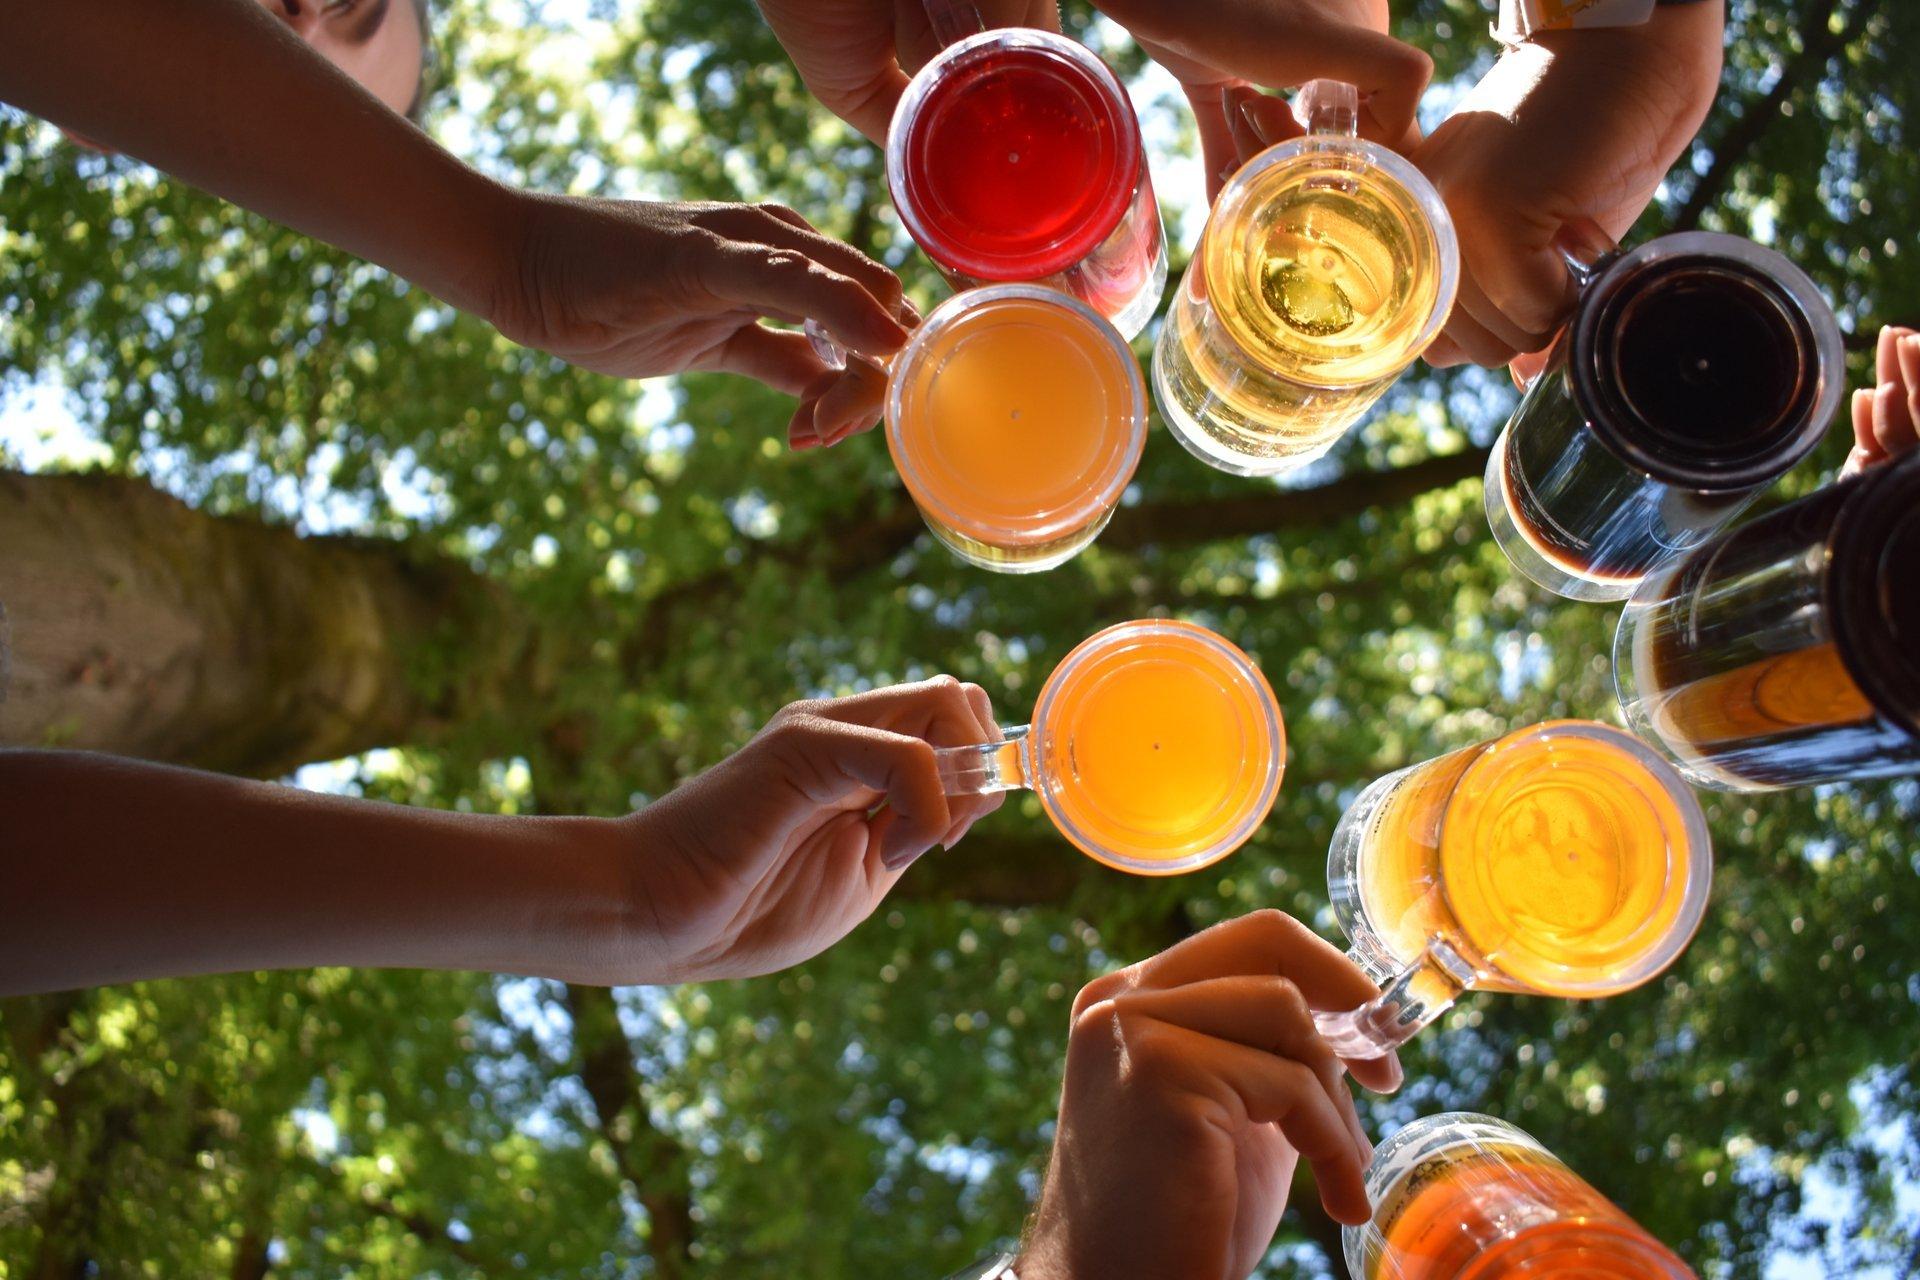 Oregon Brewers Festival in Portland 2019 - Best Time